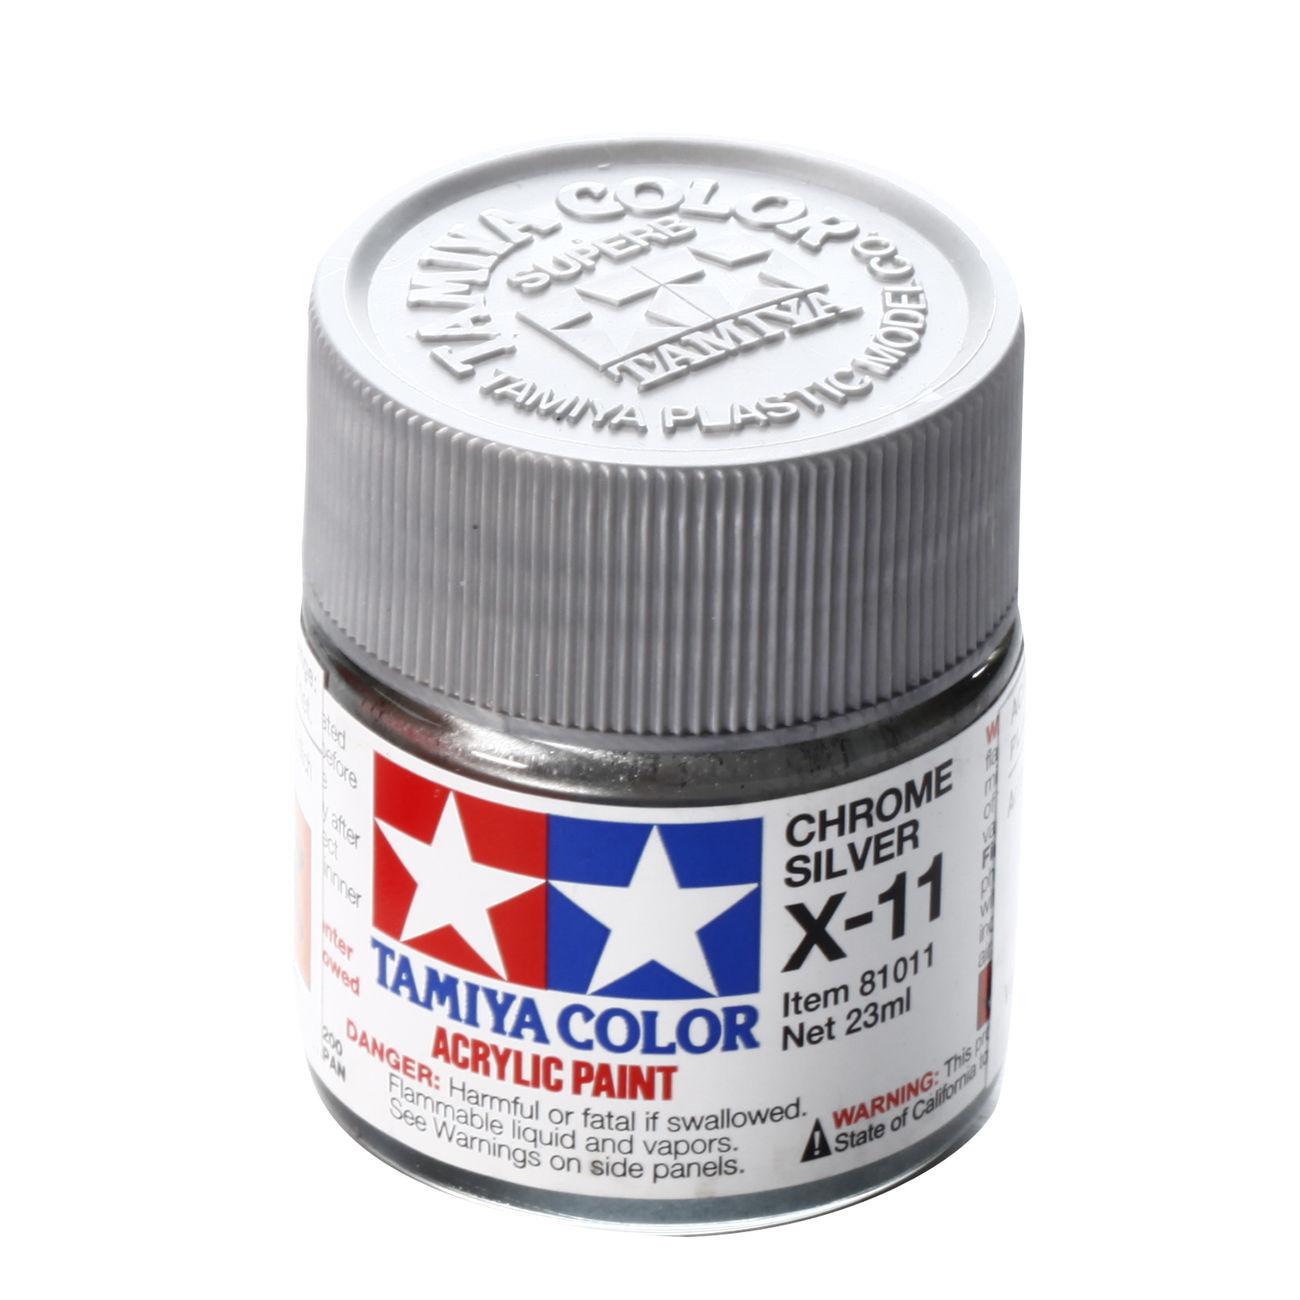 silber farbe tamiya x 11 chrom glanzend acryl harz 23ml silberfarbene turnschuhe